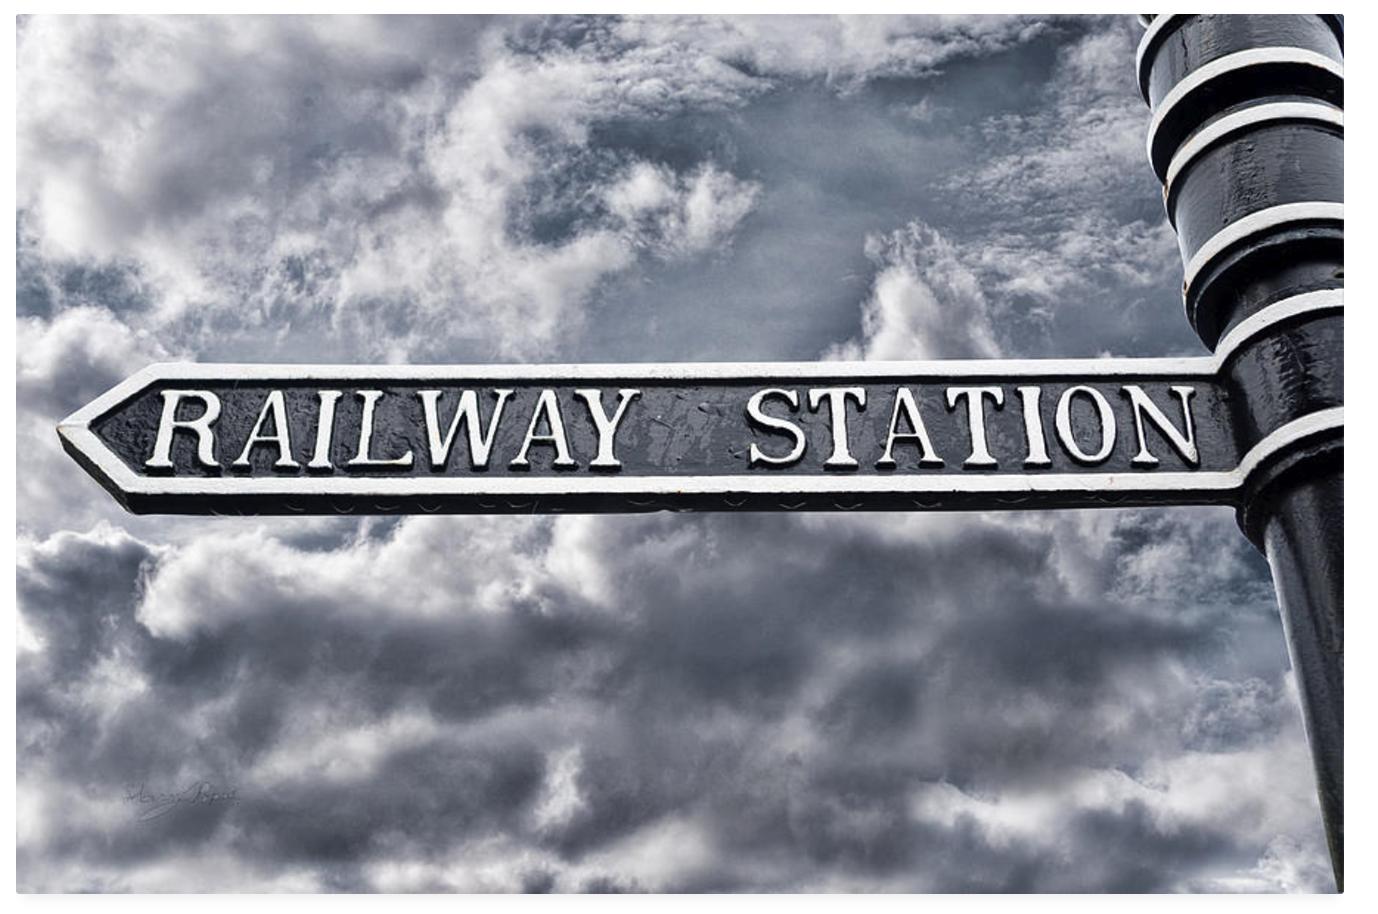 Railway Station